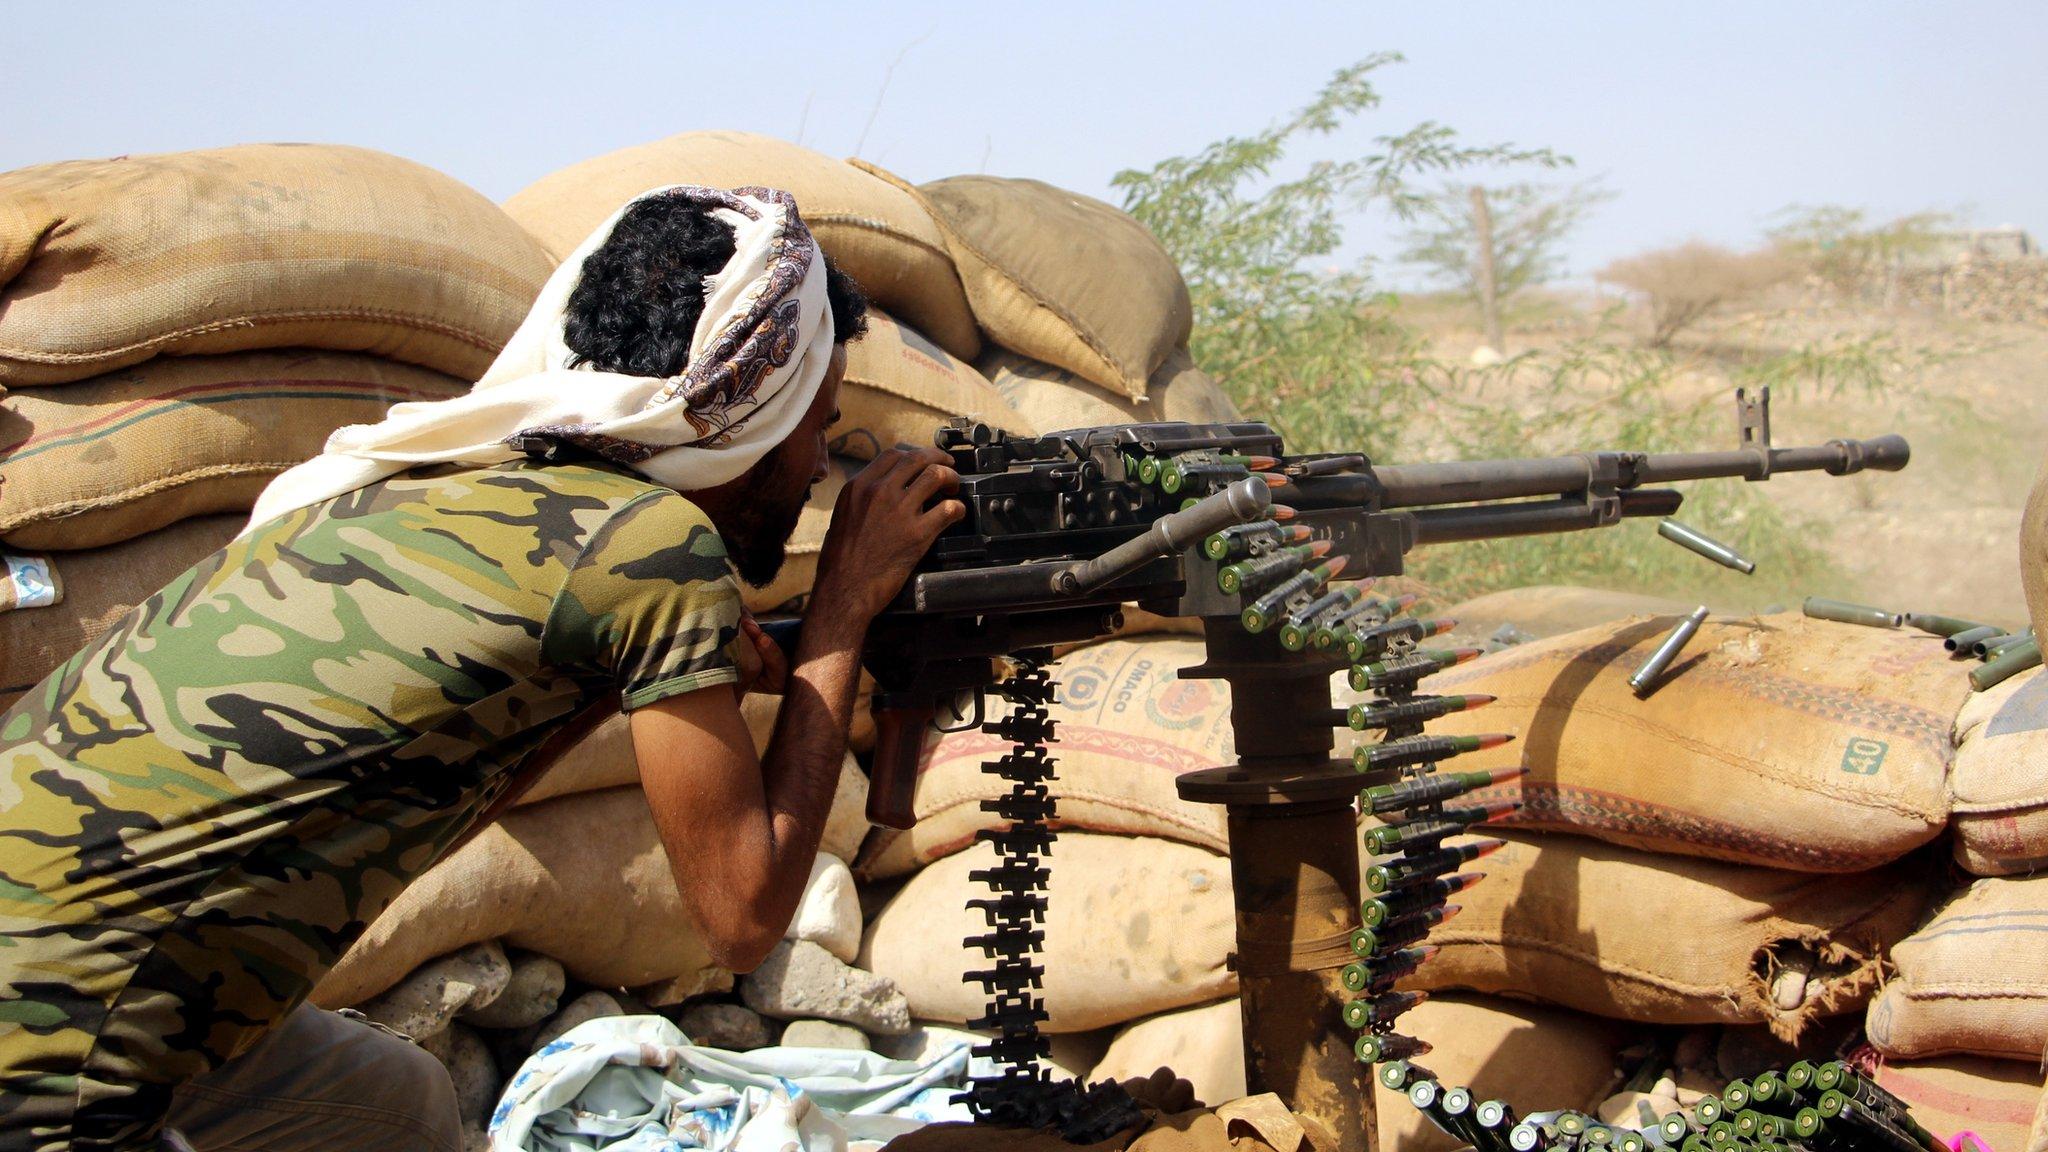 UAE arming Yemen militias with Western weapons - Amnesty